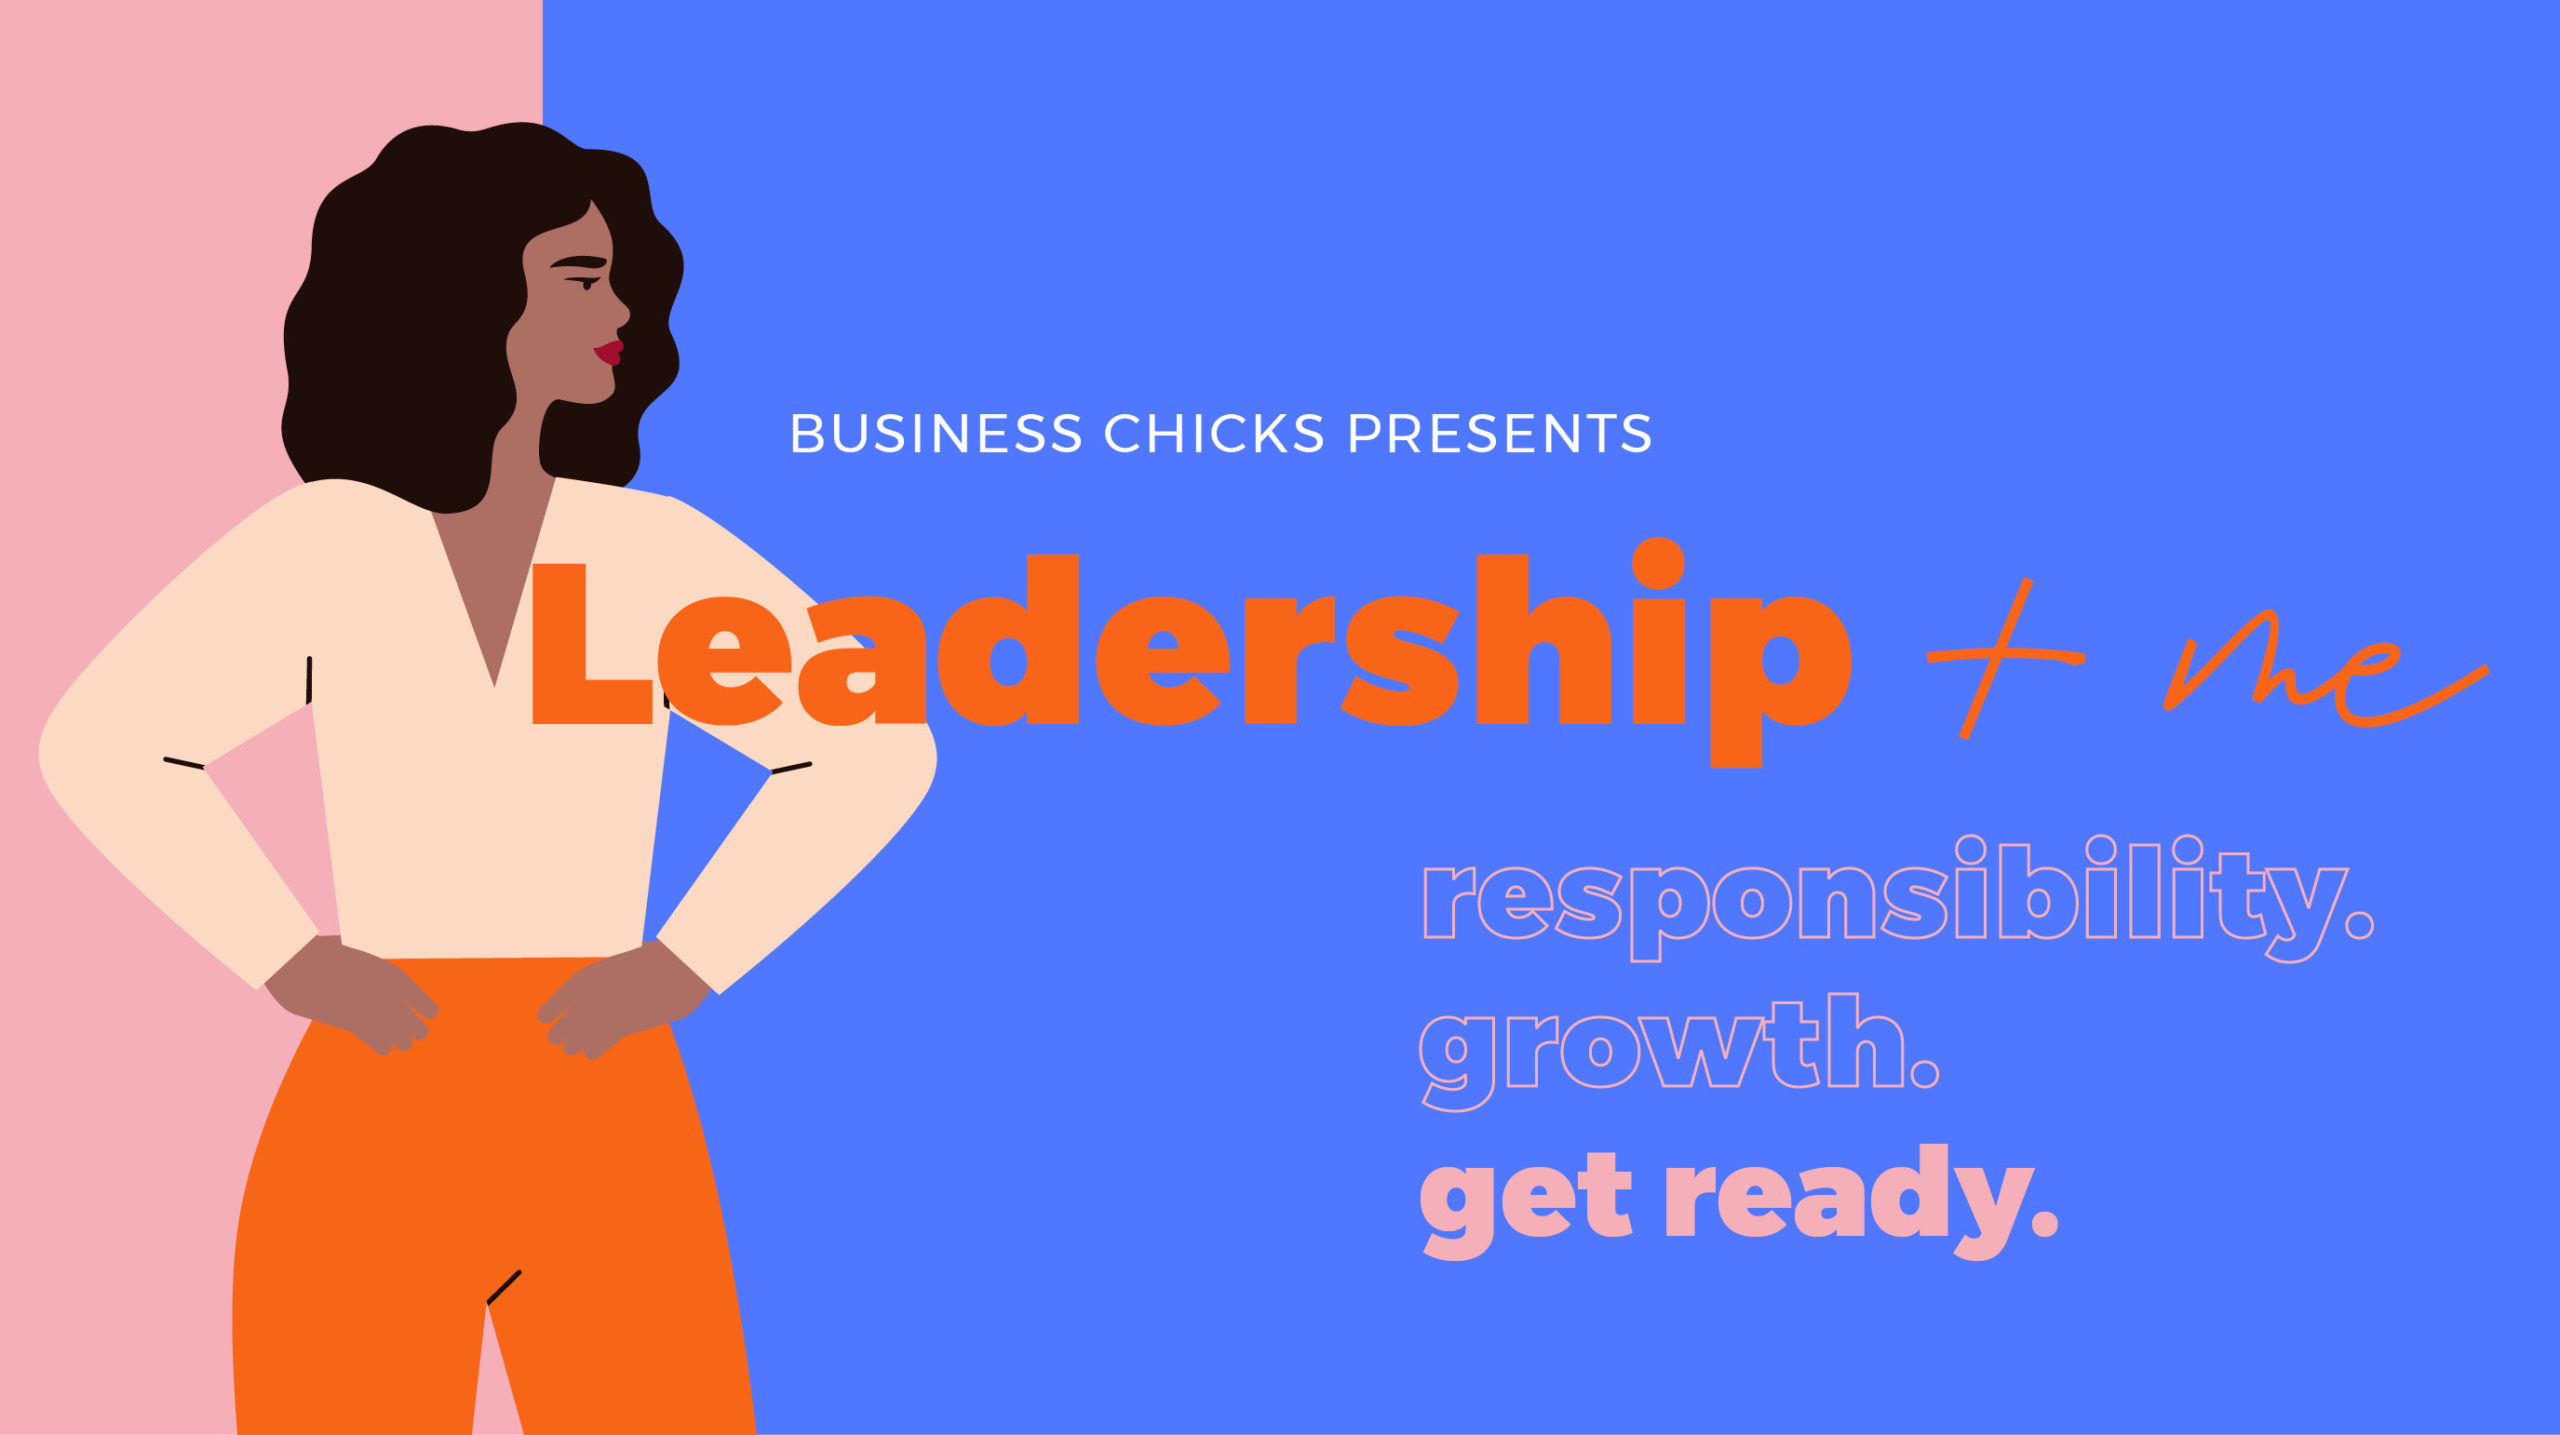 Leadership + me